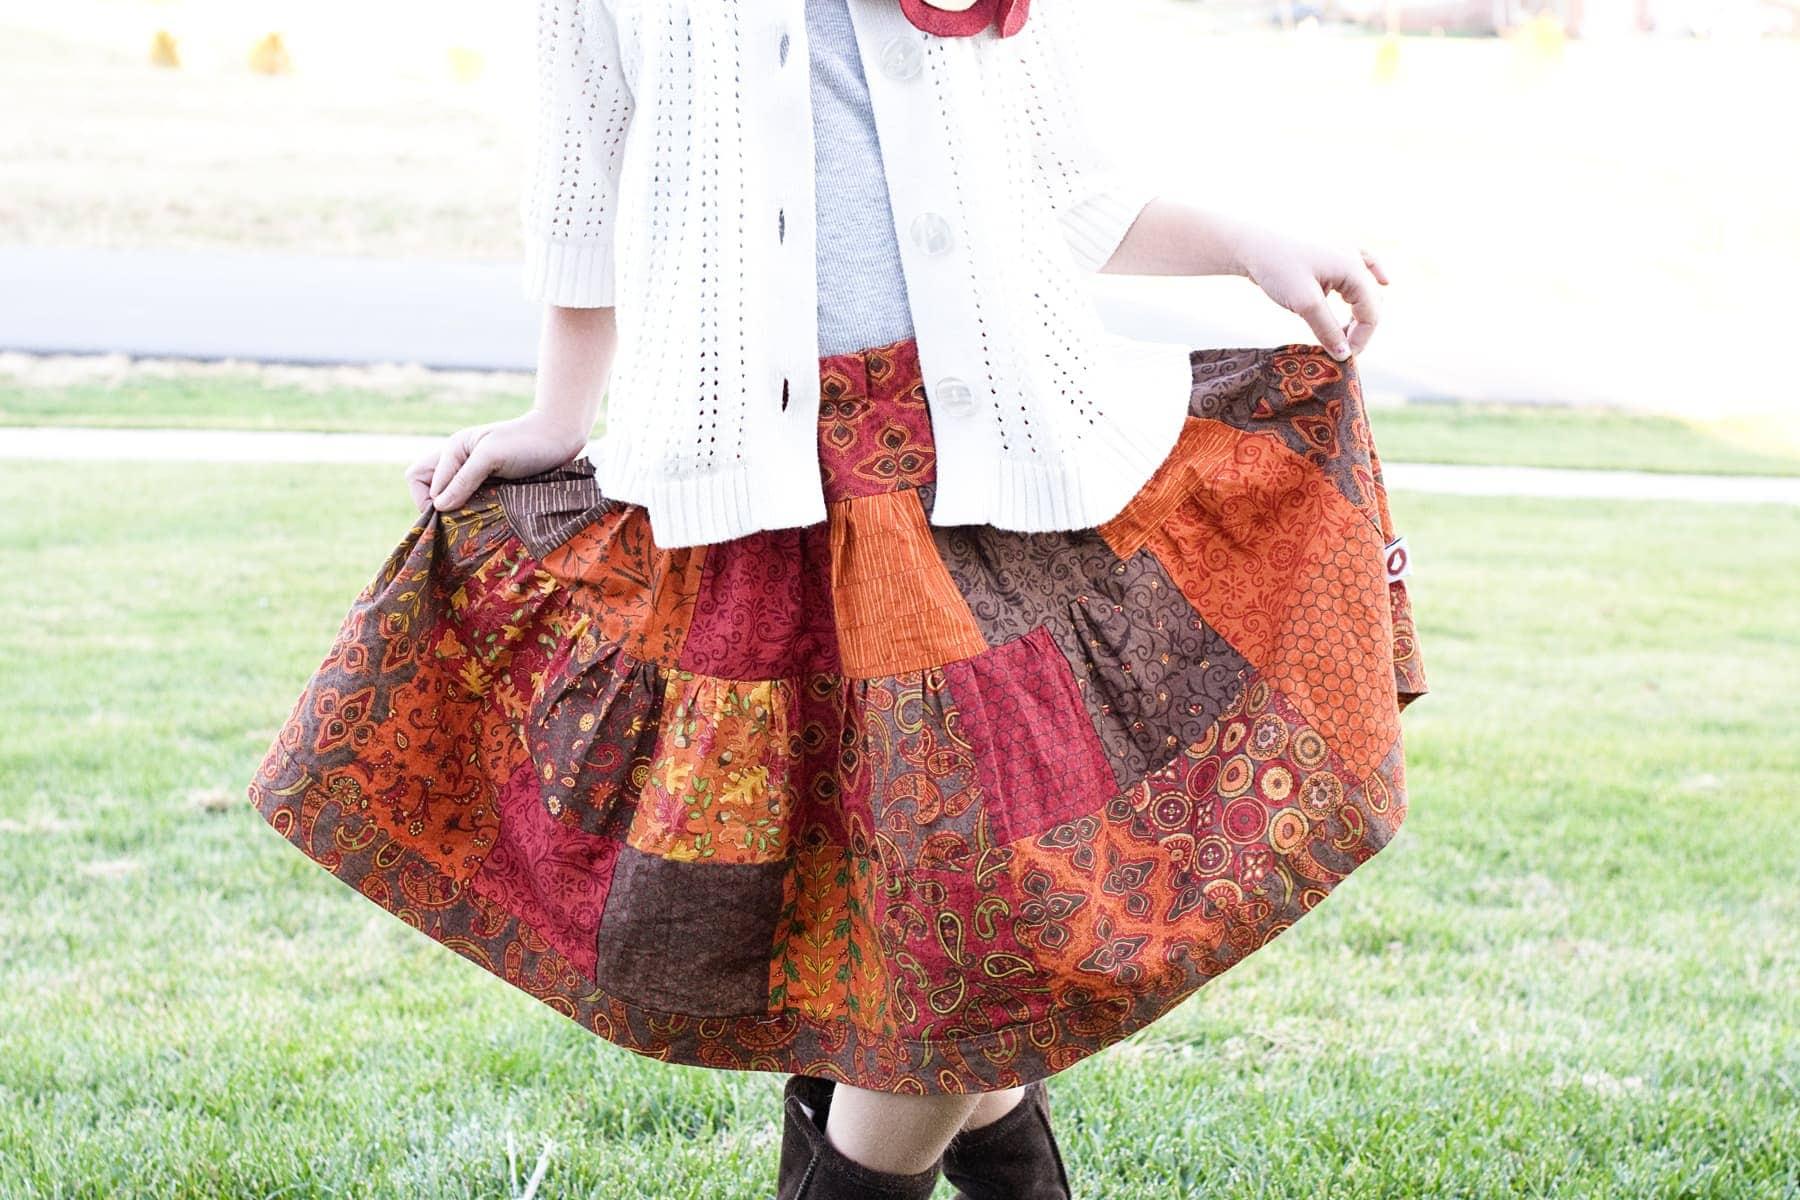 Tuesday Tutorial Patchwork Skirt - The Polkadot Chair